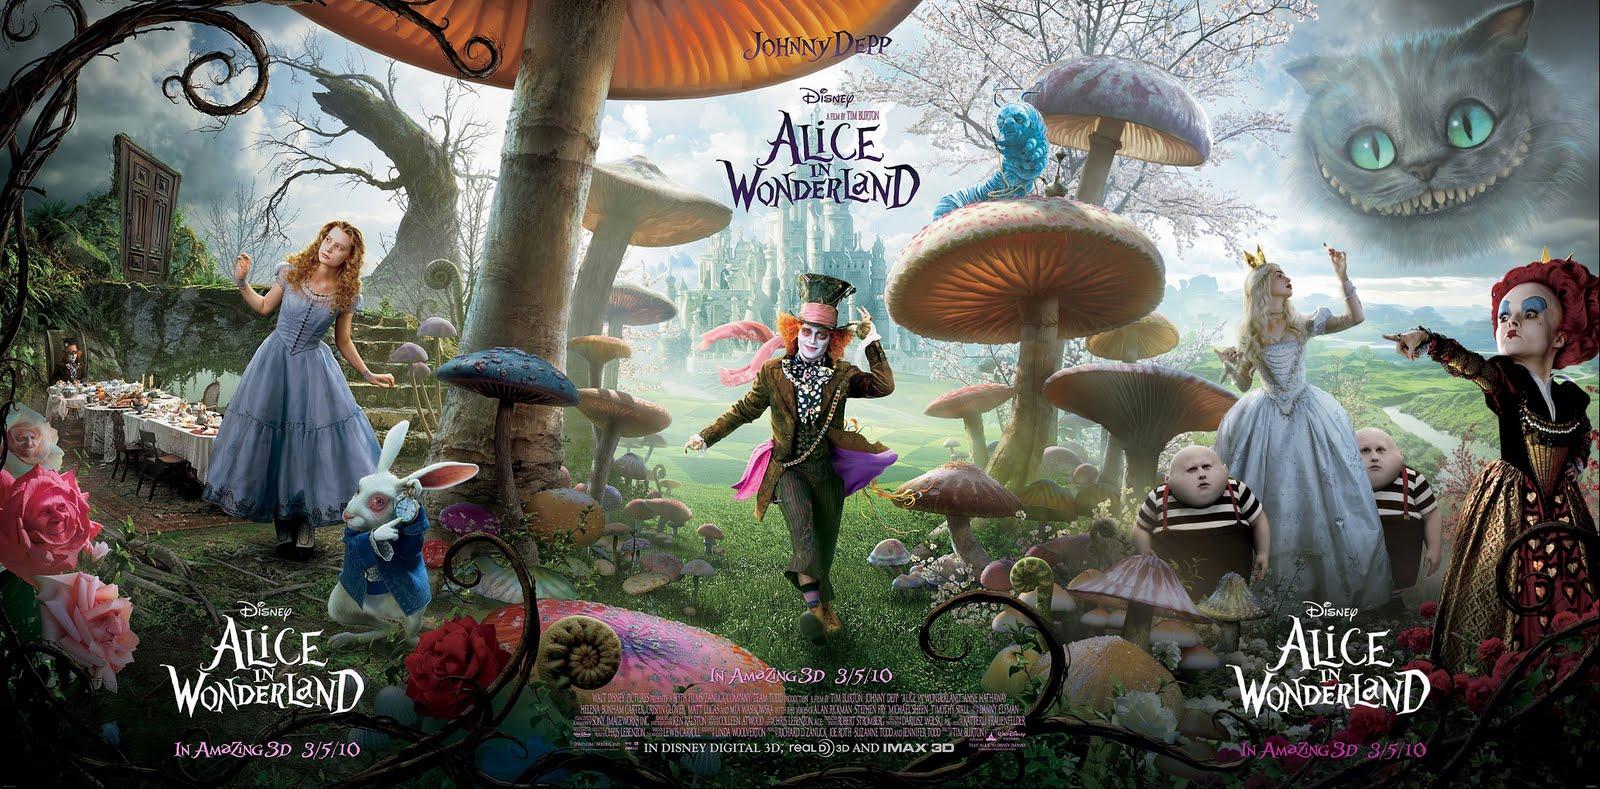 http://2.bp.blogspot.com/_2GMlhUrYuhI/SwKT-4E2E3I/AAAAAAAAITU/Frn3vkqbCA4/s1600/Alice_In_Wonderland_Full_Banner_Pic.jpg